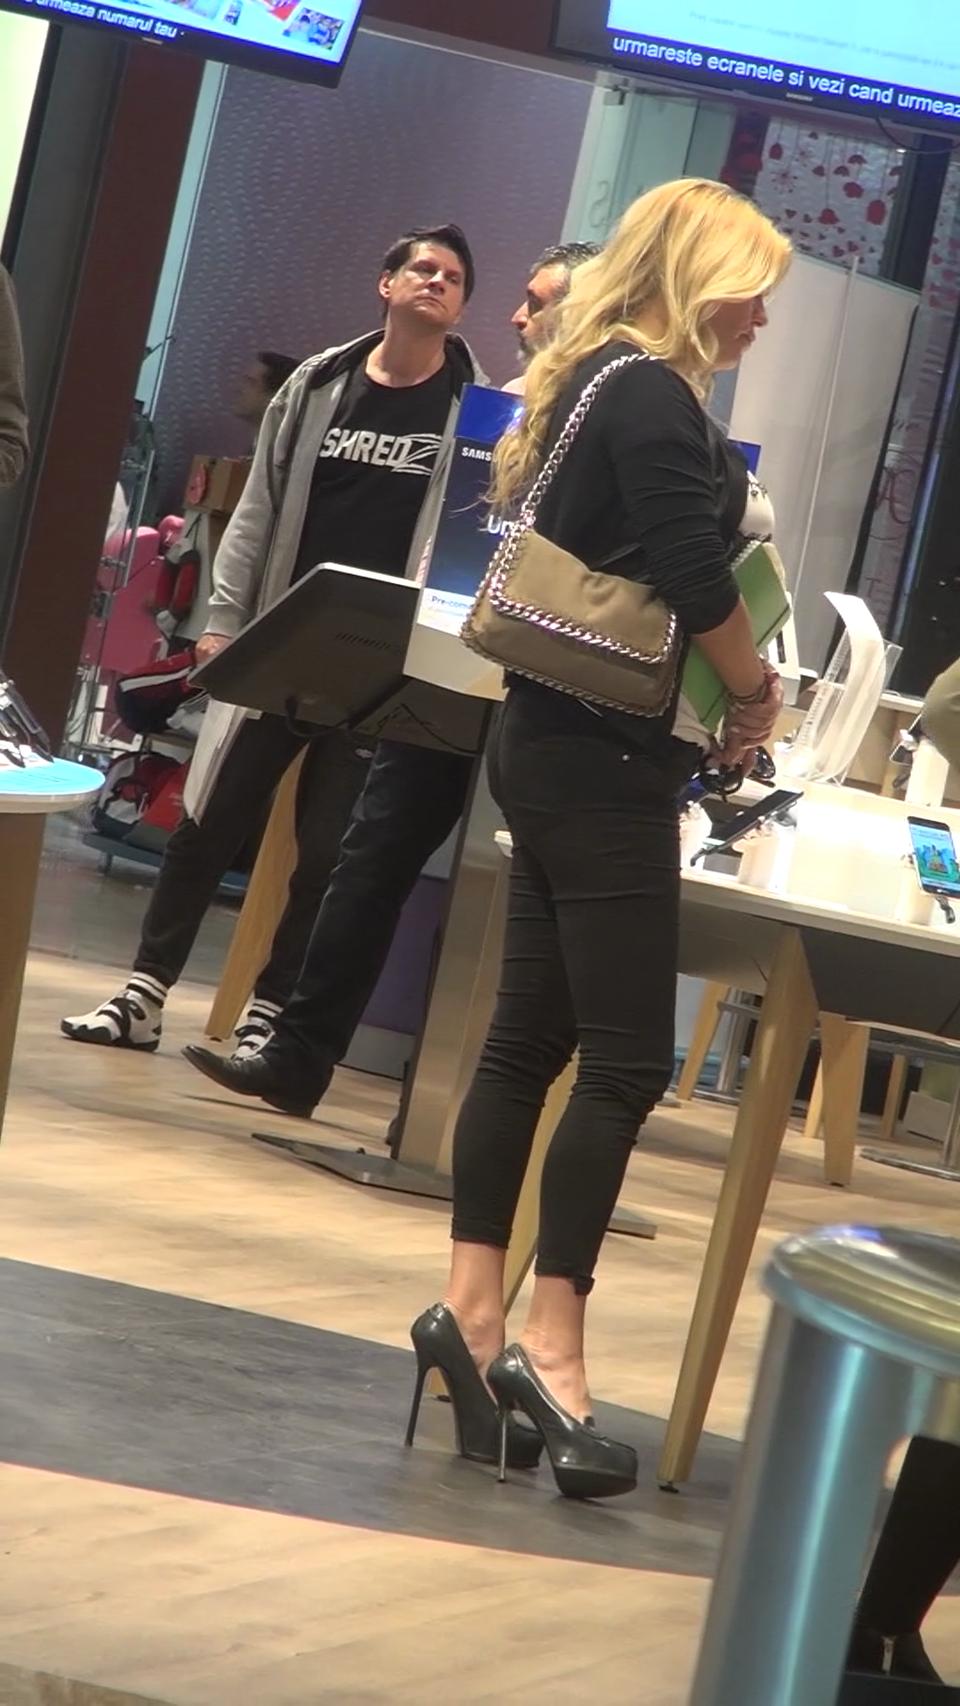 Leta Ilie isi rezolva problemele, la mall, pe tocuri de 20 de cm! Abia a putut sa mearga | VIDEO